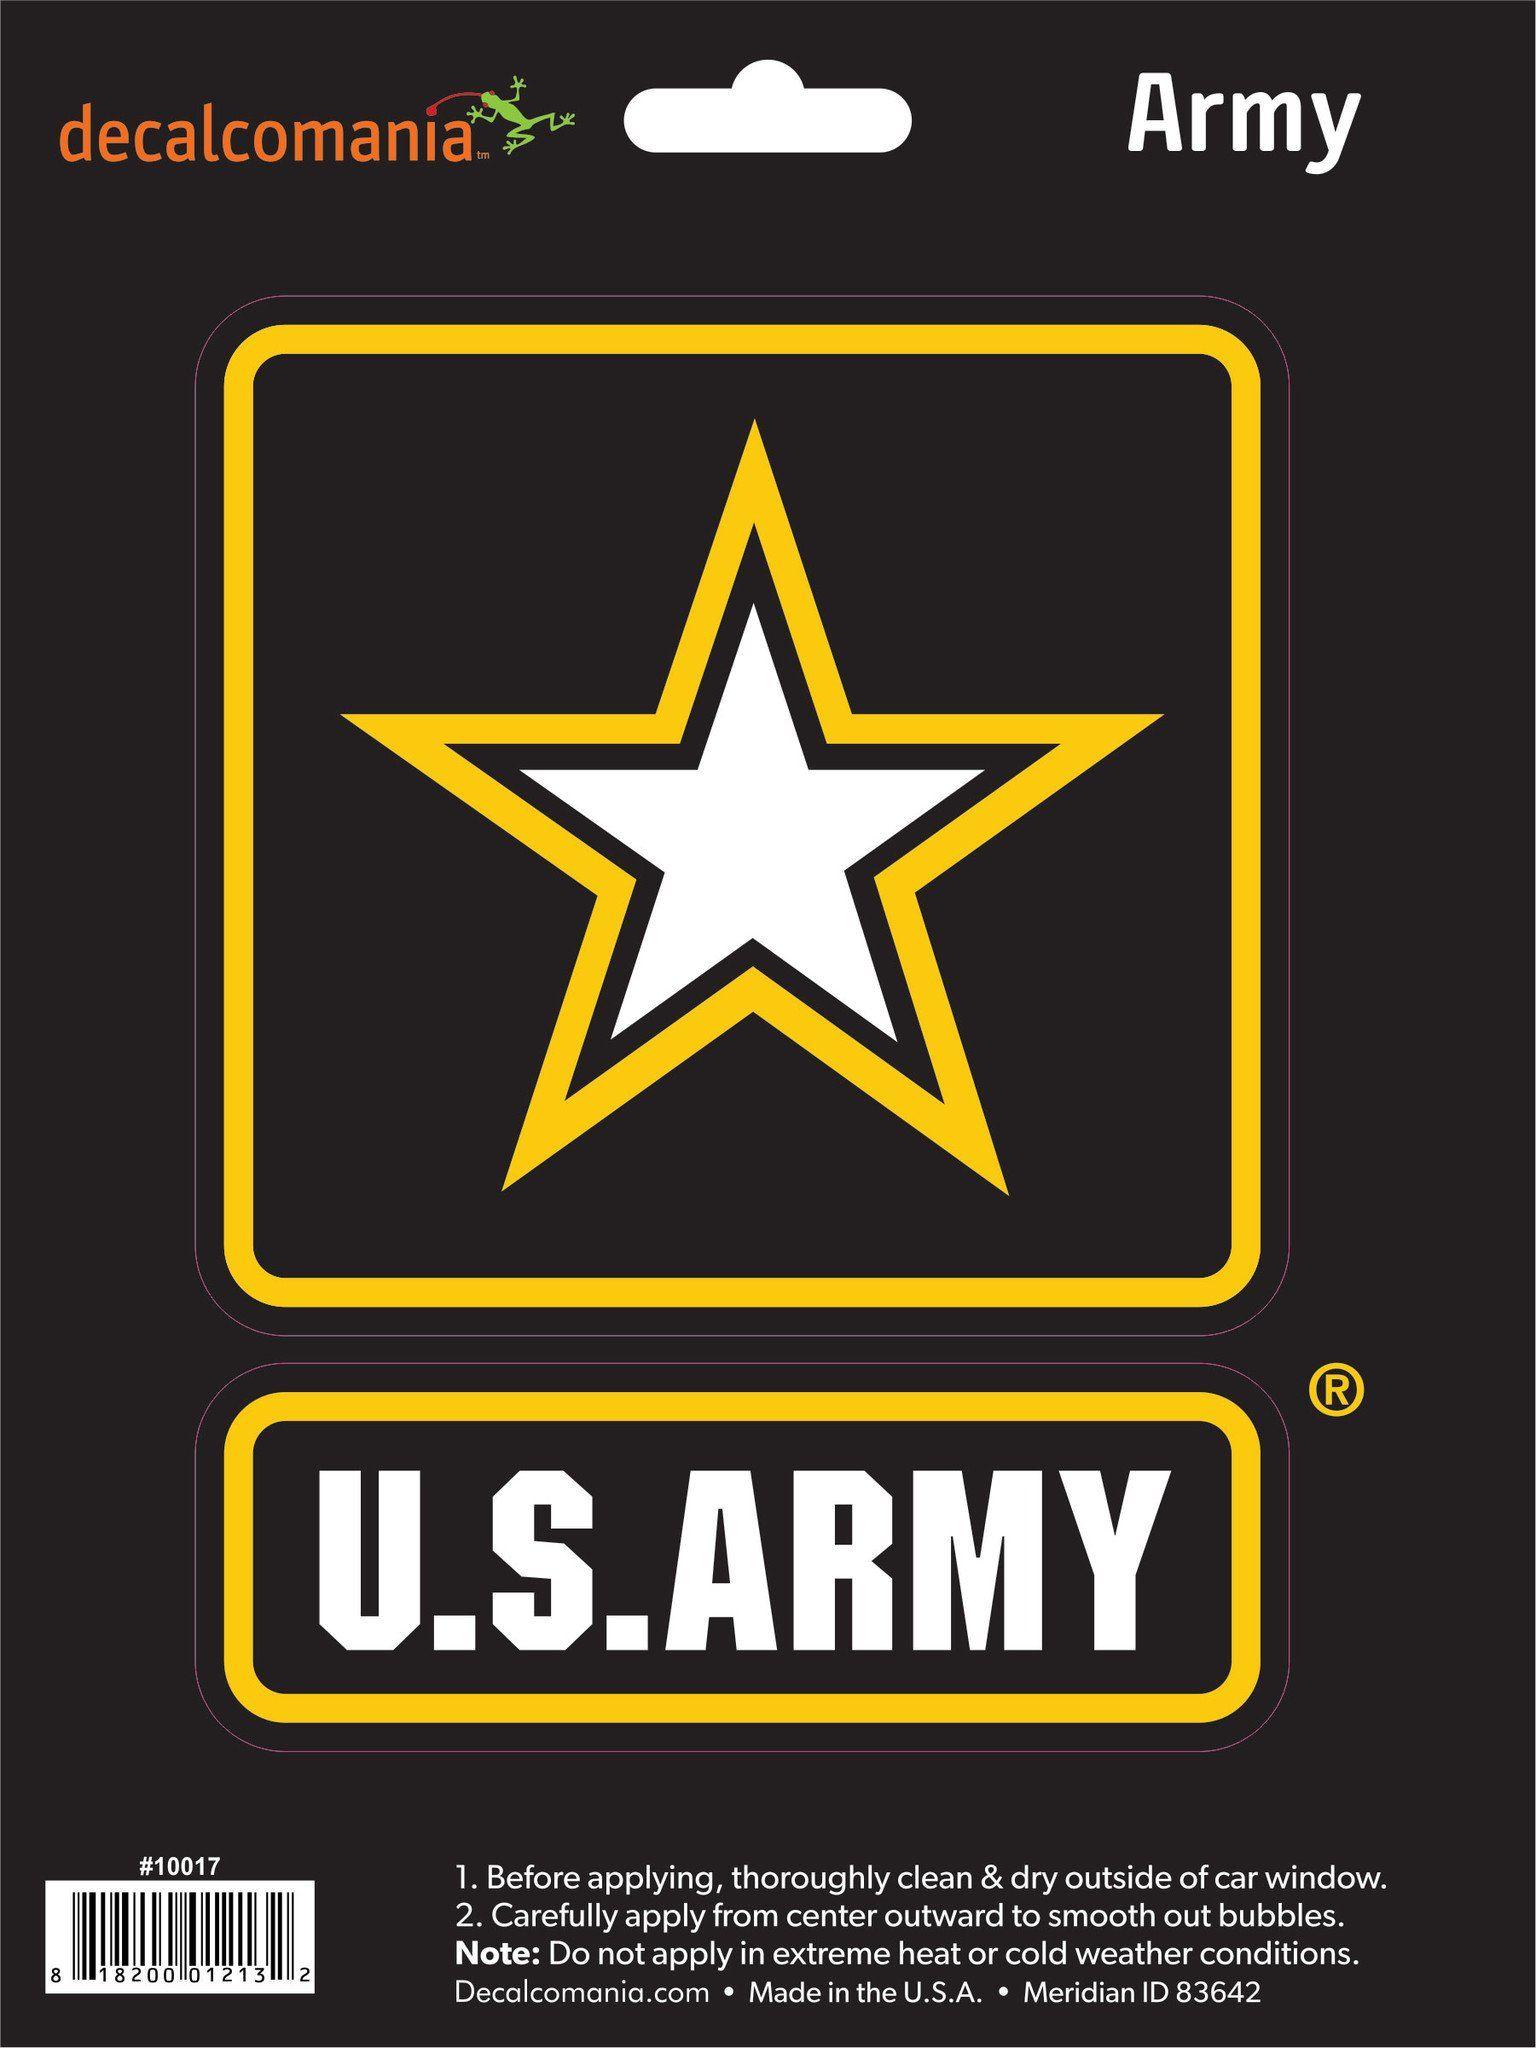 United States Army Logo Decal Ejército de estados unidos